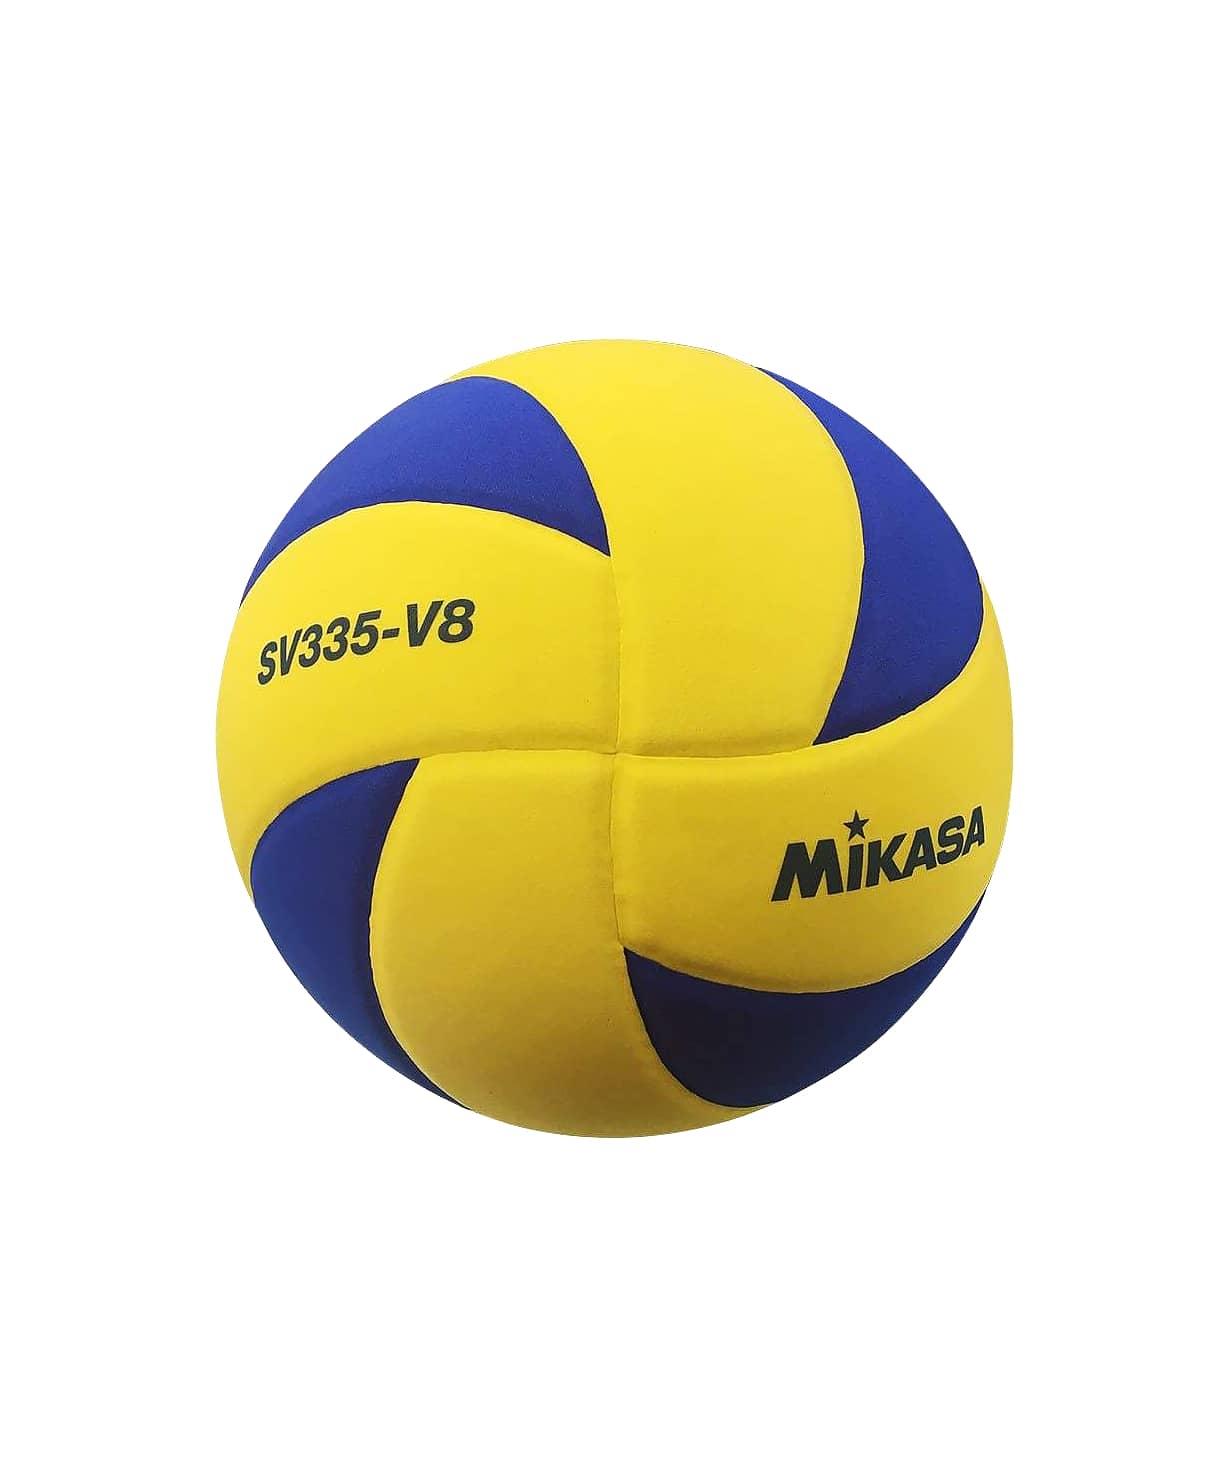 Мяч для волейбола на снегу SV335-V8